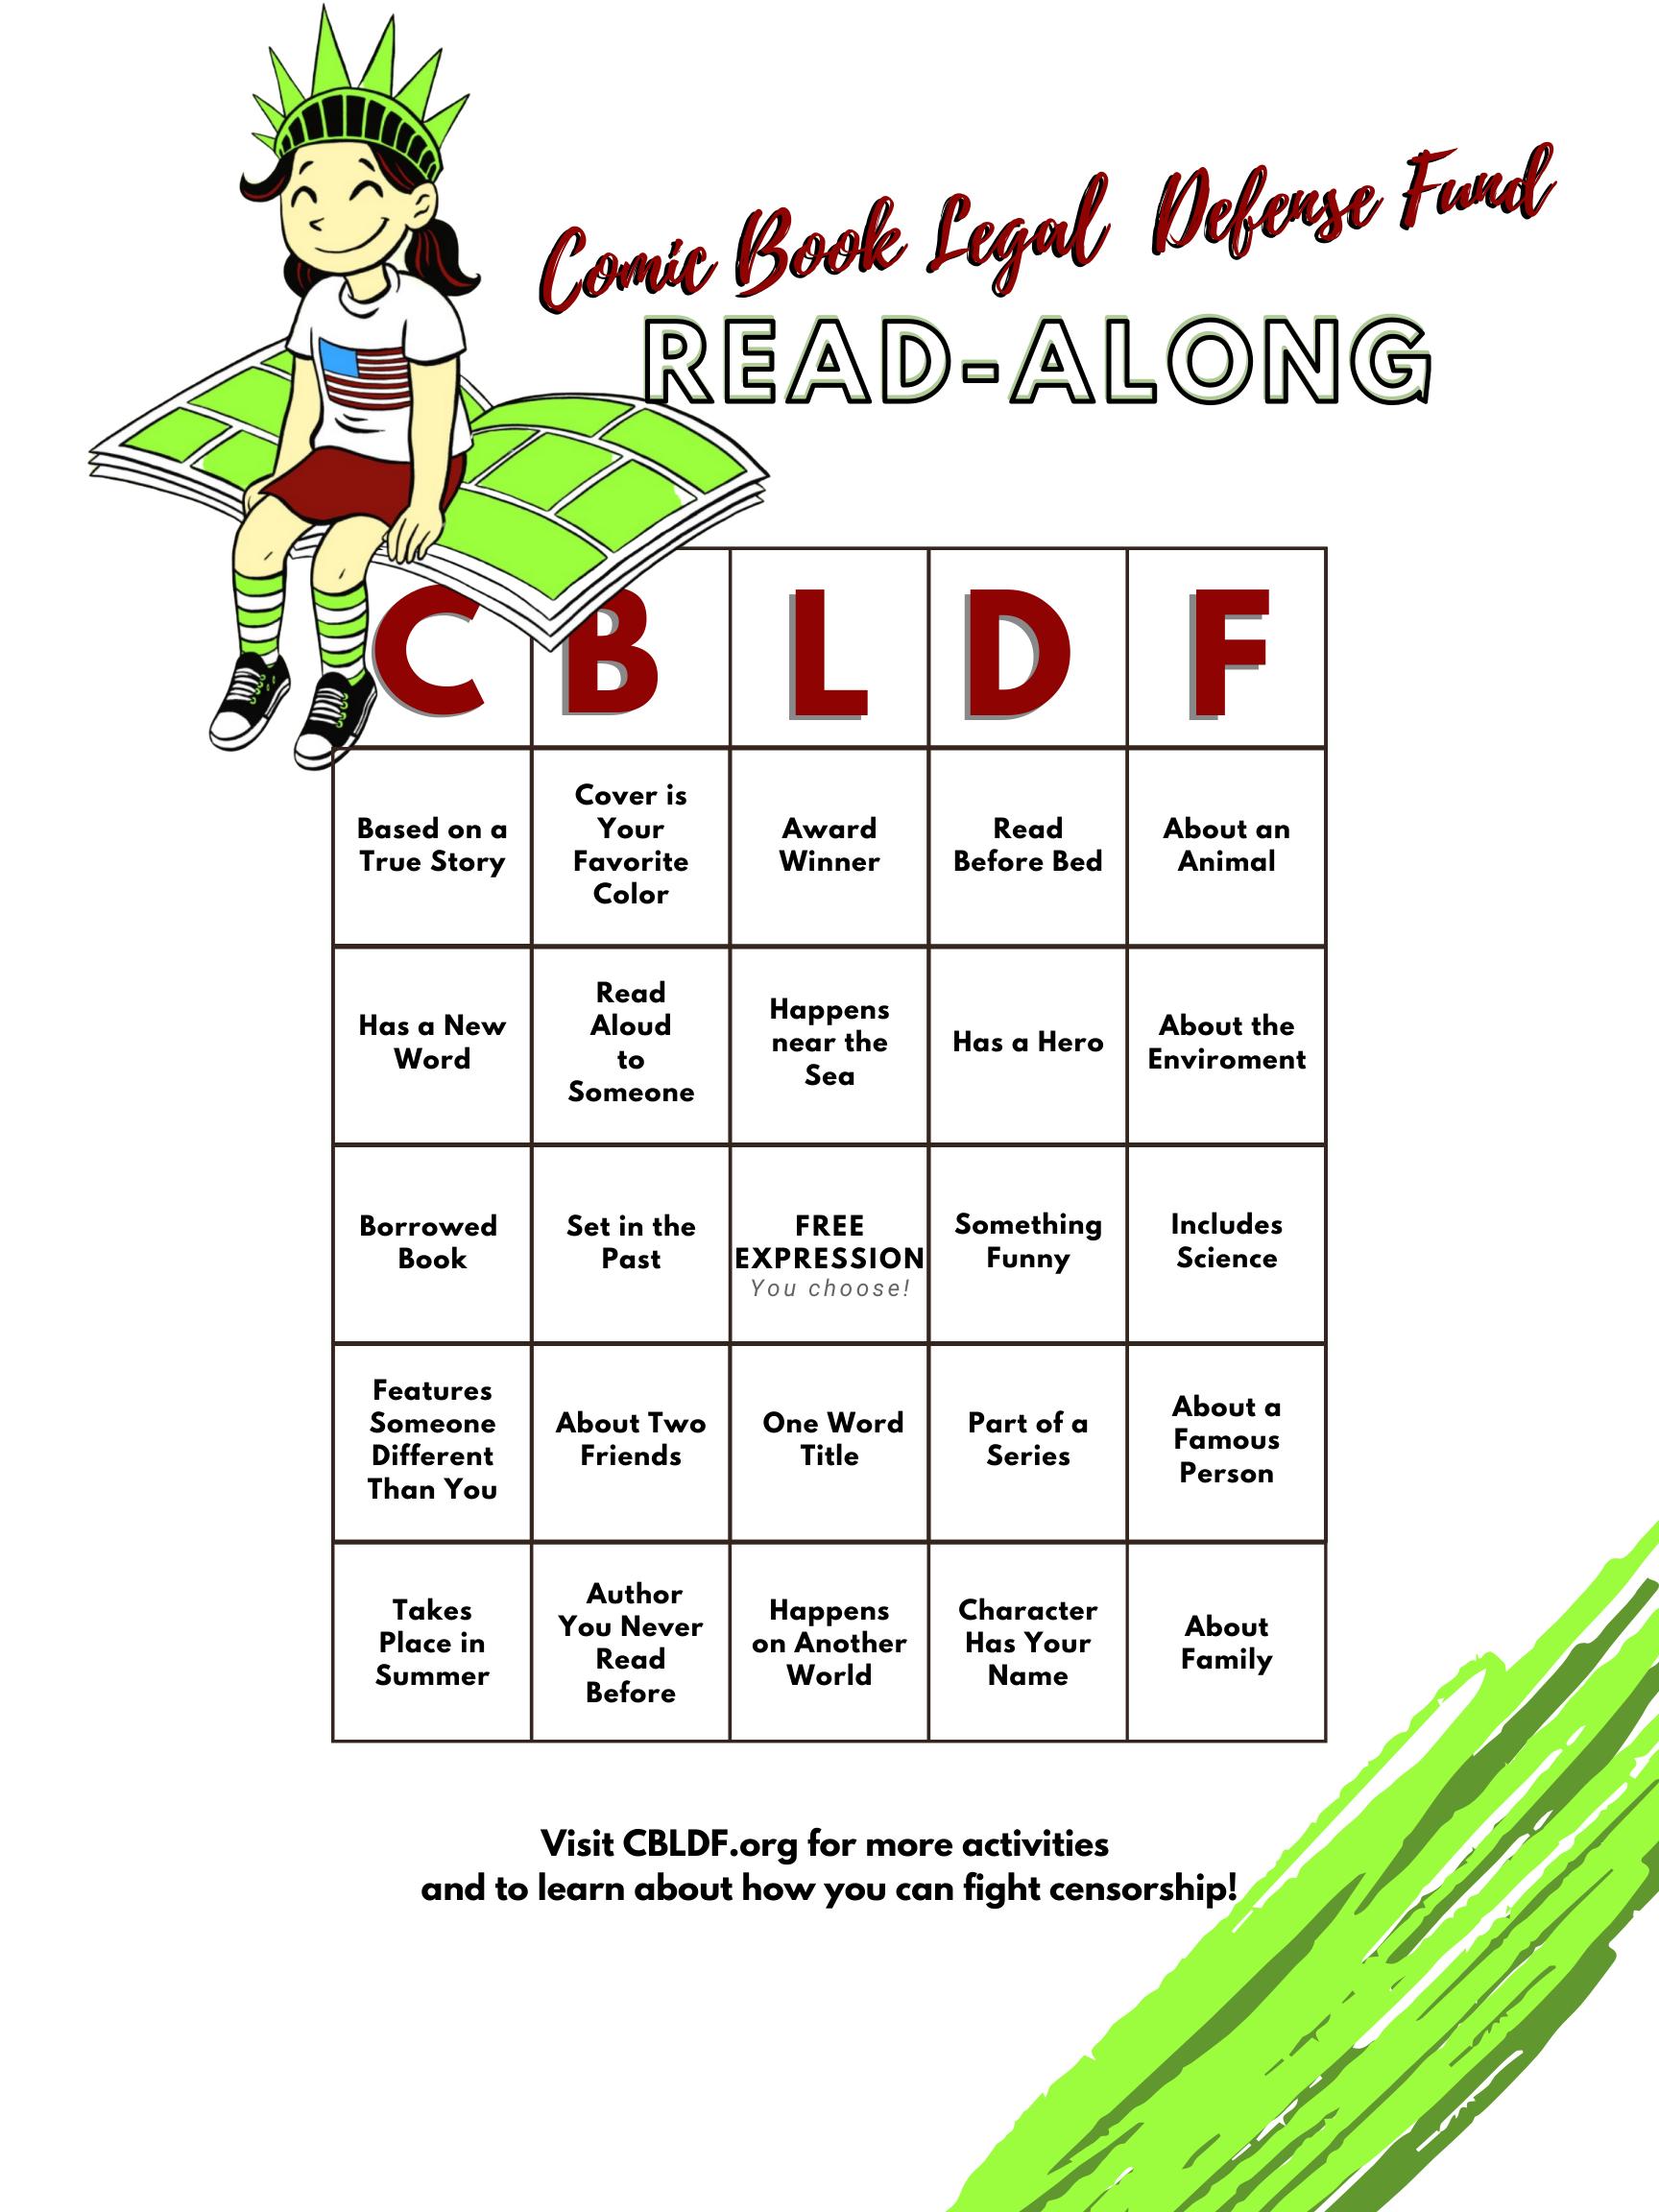 CBLDF Bingo Kid Card